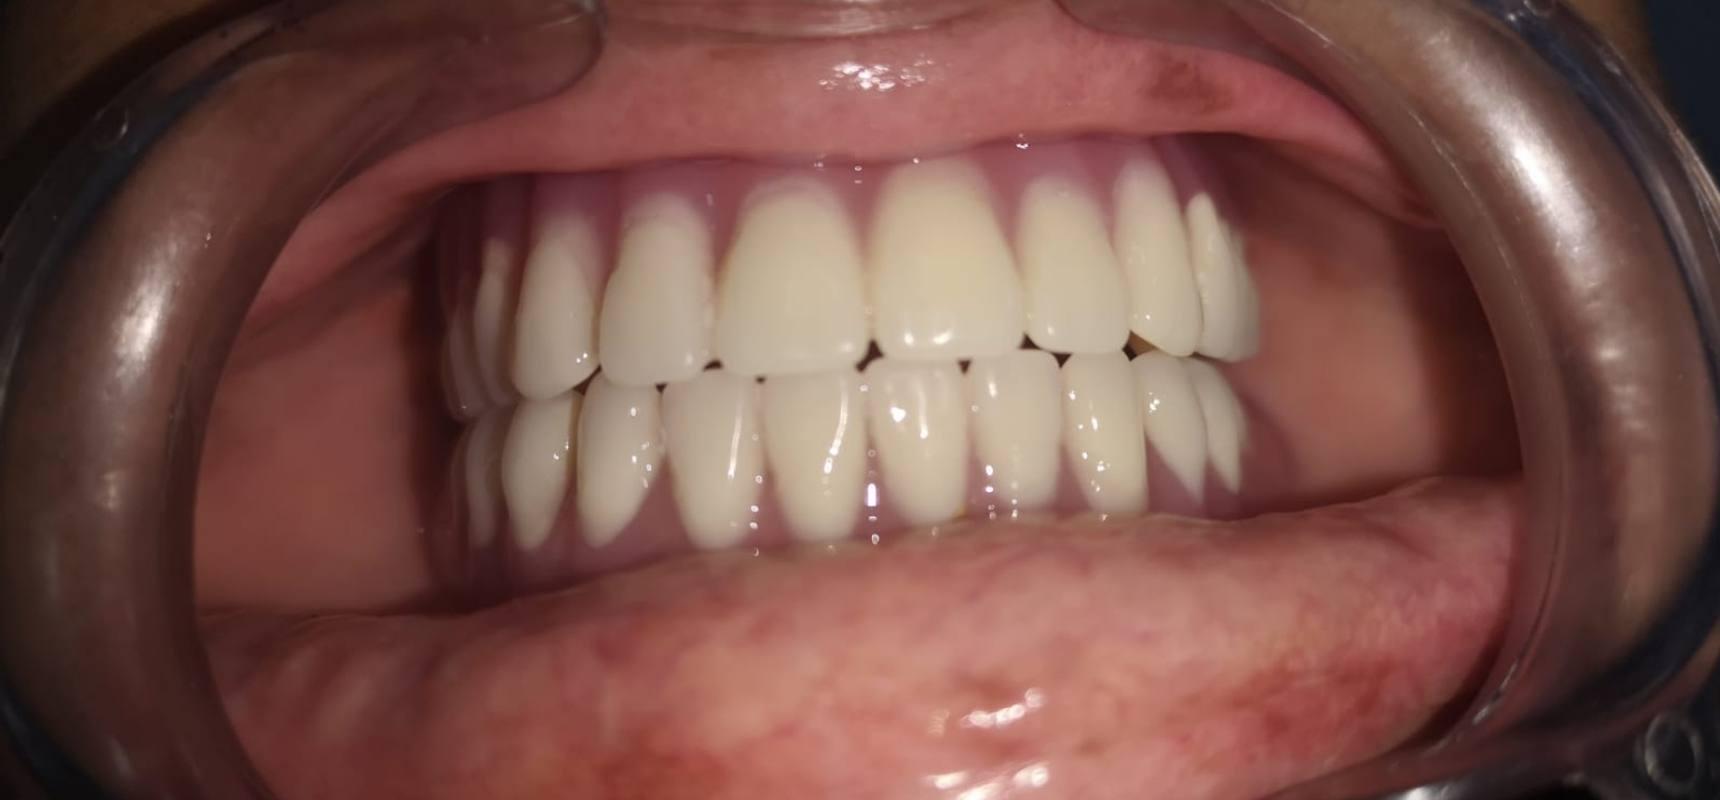 After-Denture Done